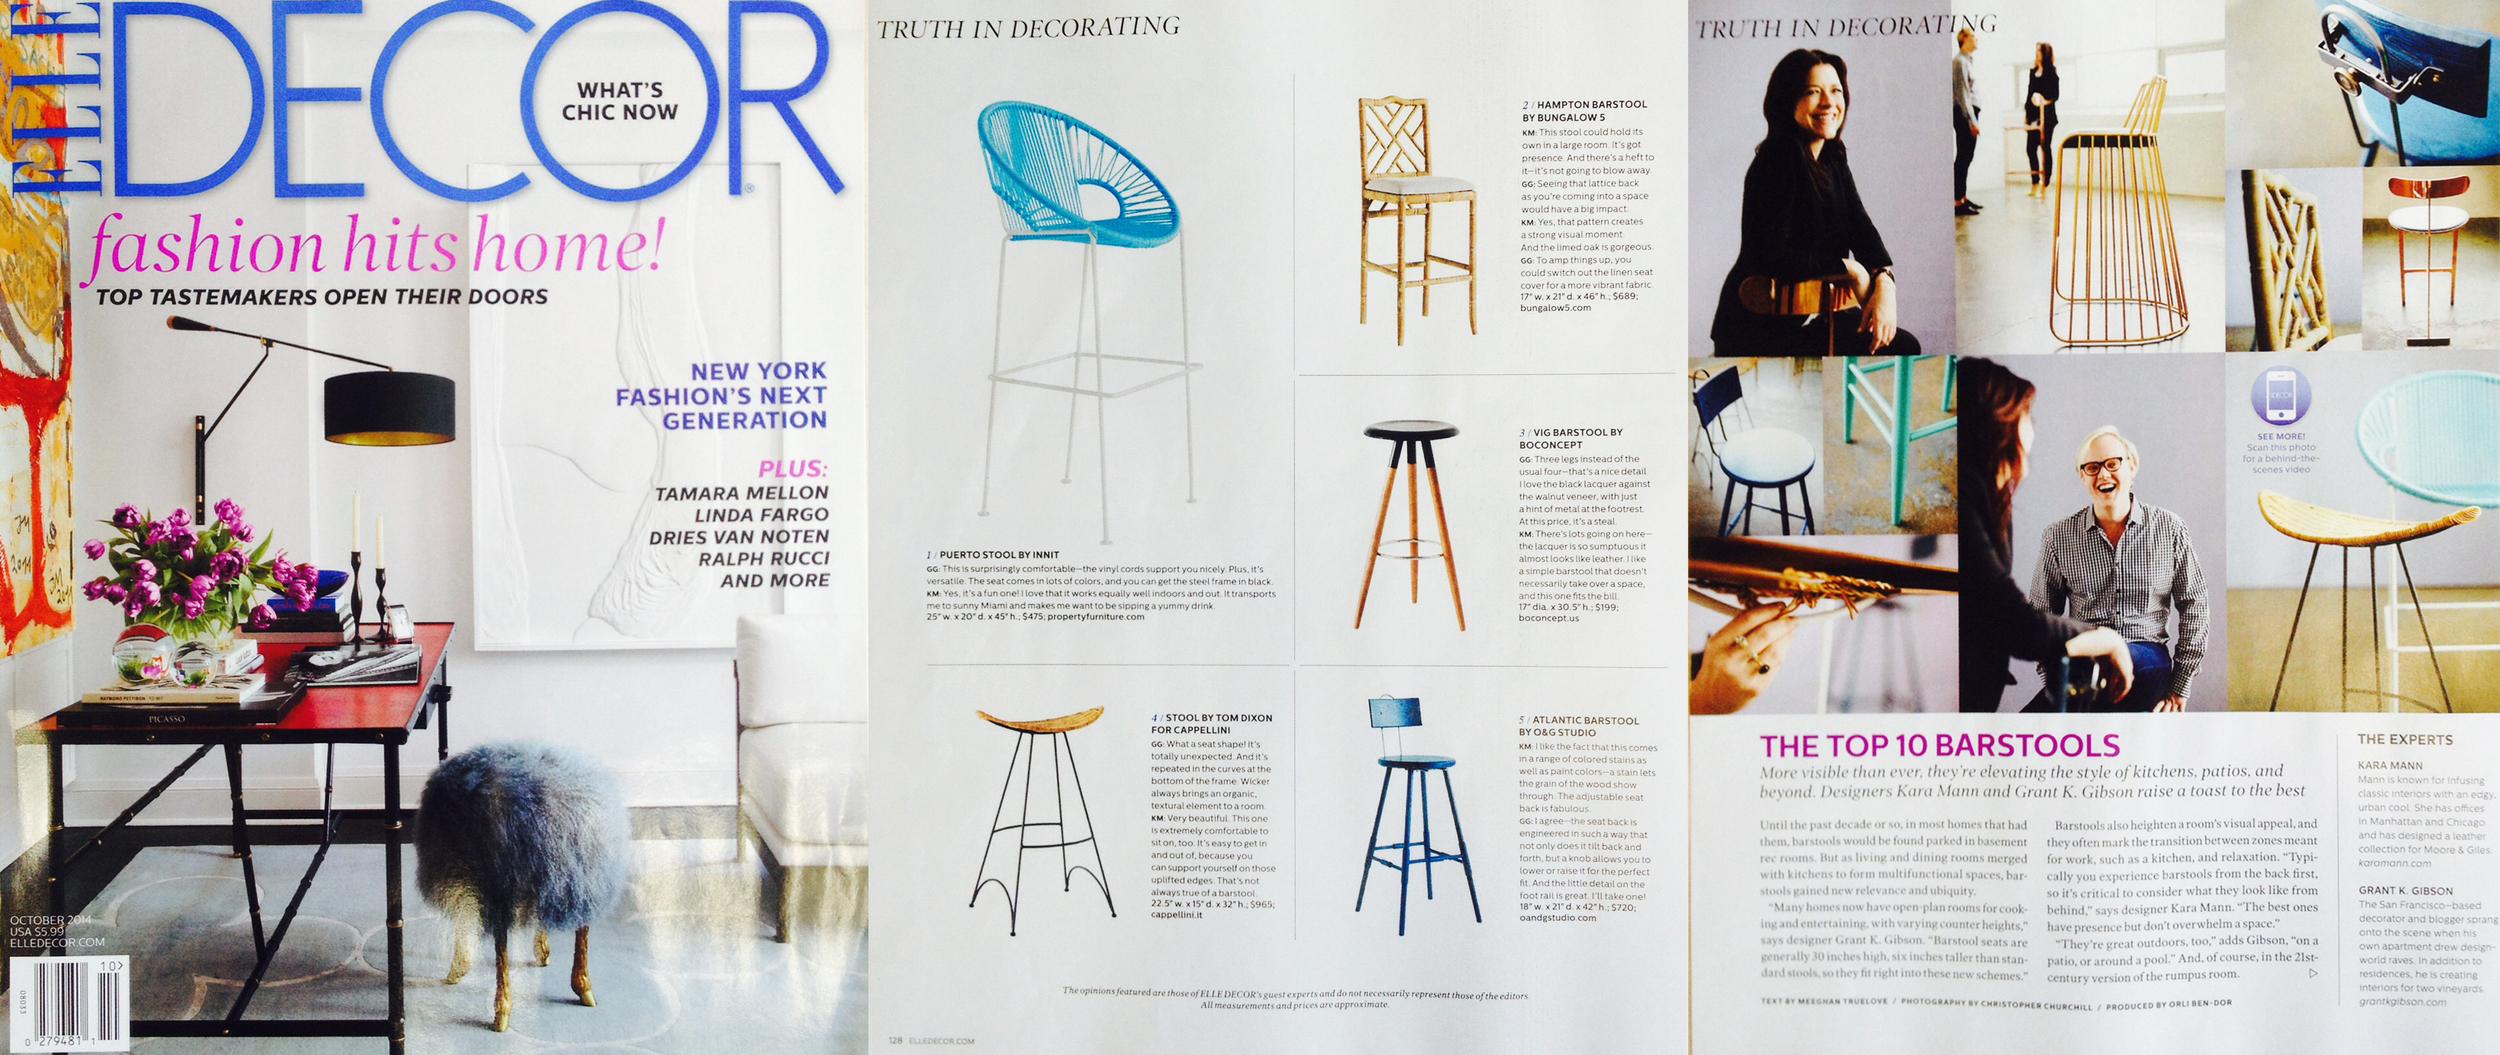 Top Ten Barstools - October 2014 Elle Decor